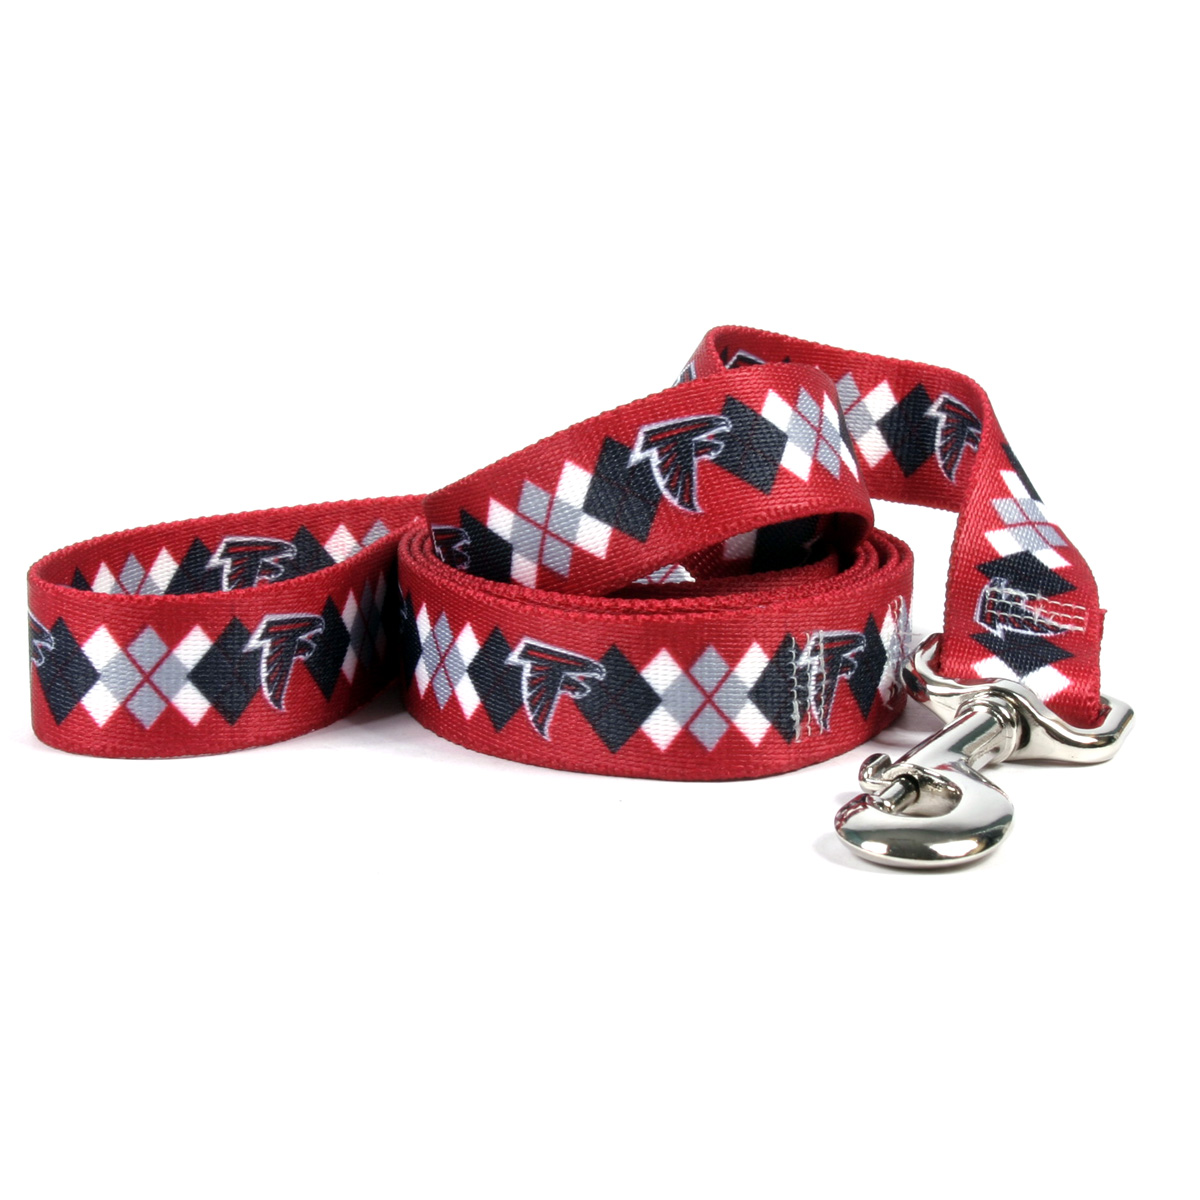 Atlanta Falcons Argyle Dog Leash FALCA110